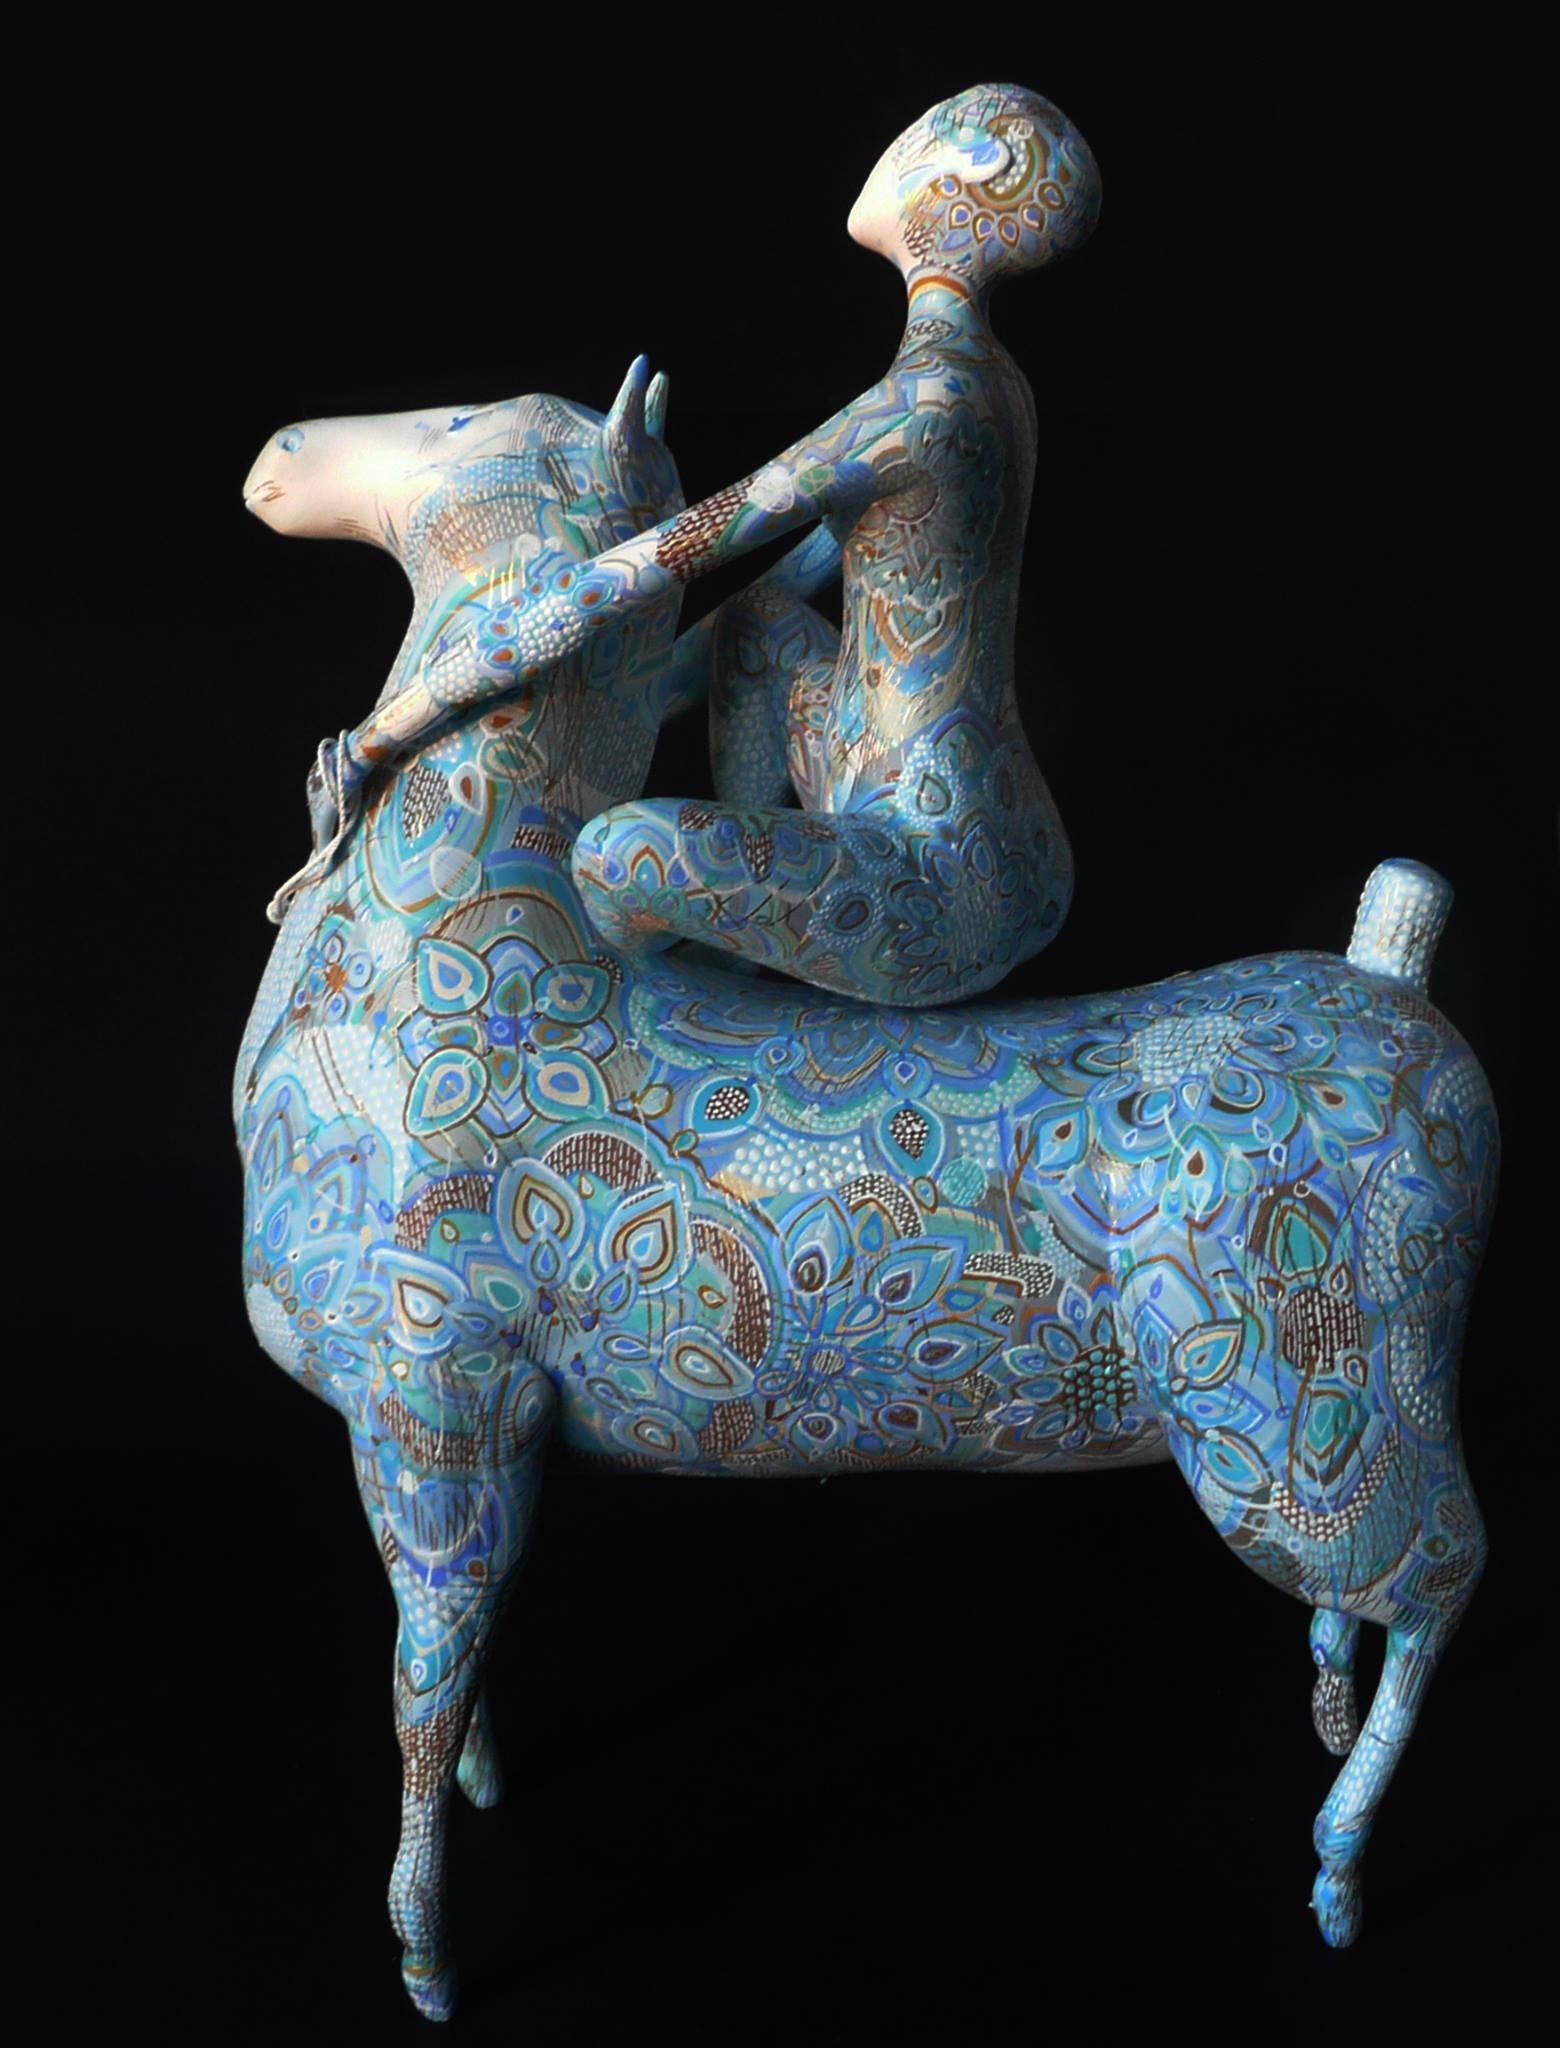 Yulia Luchkina – Sculpture